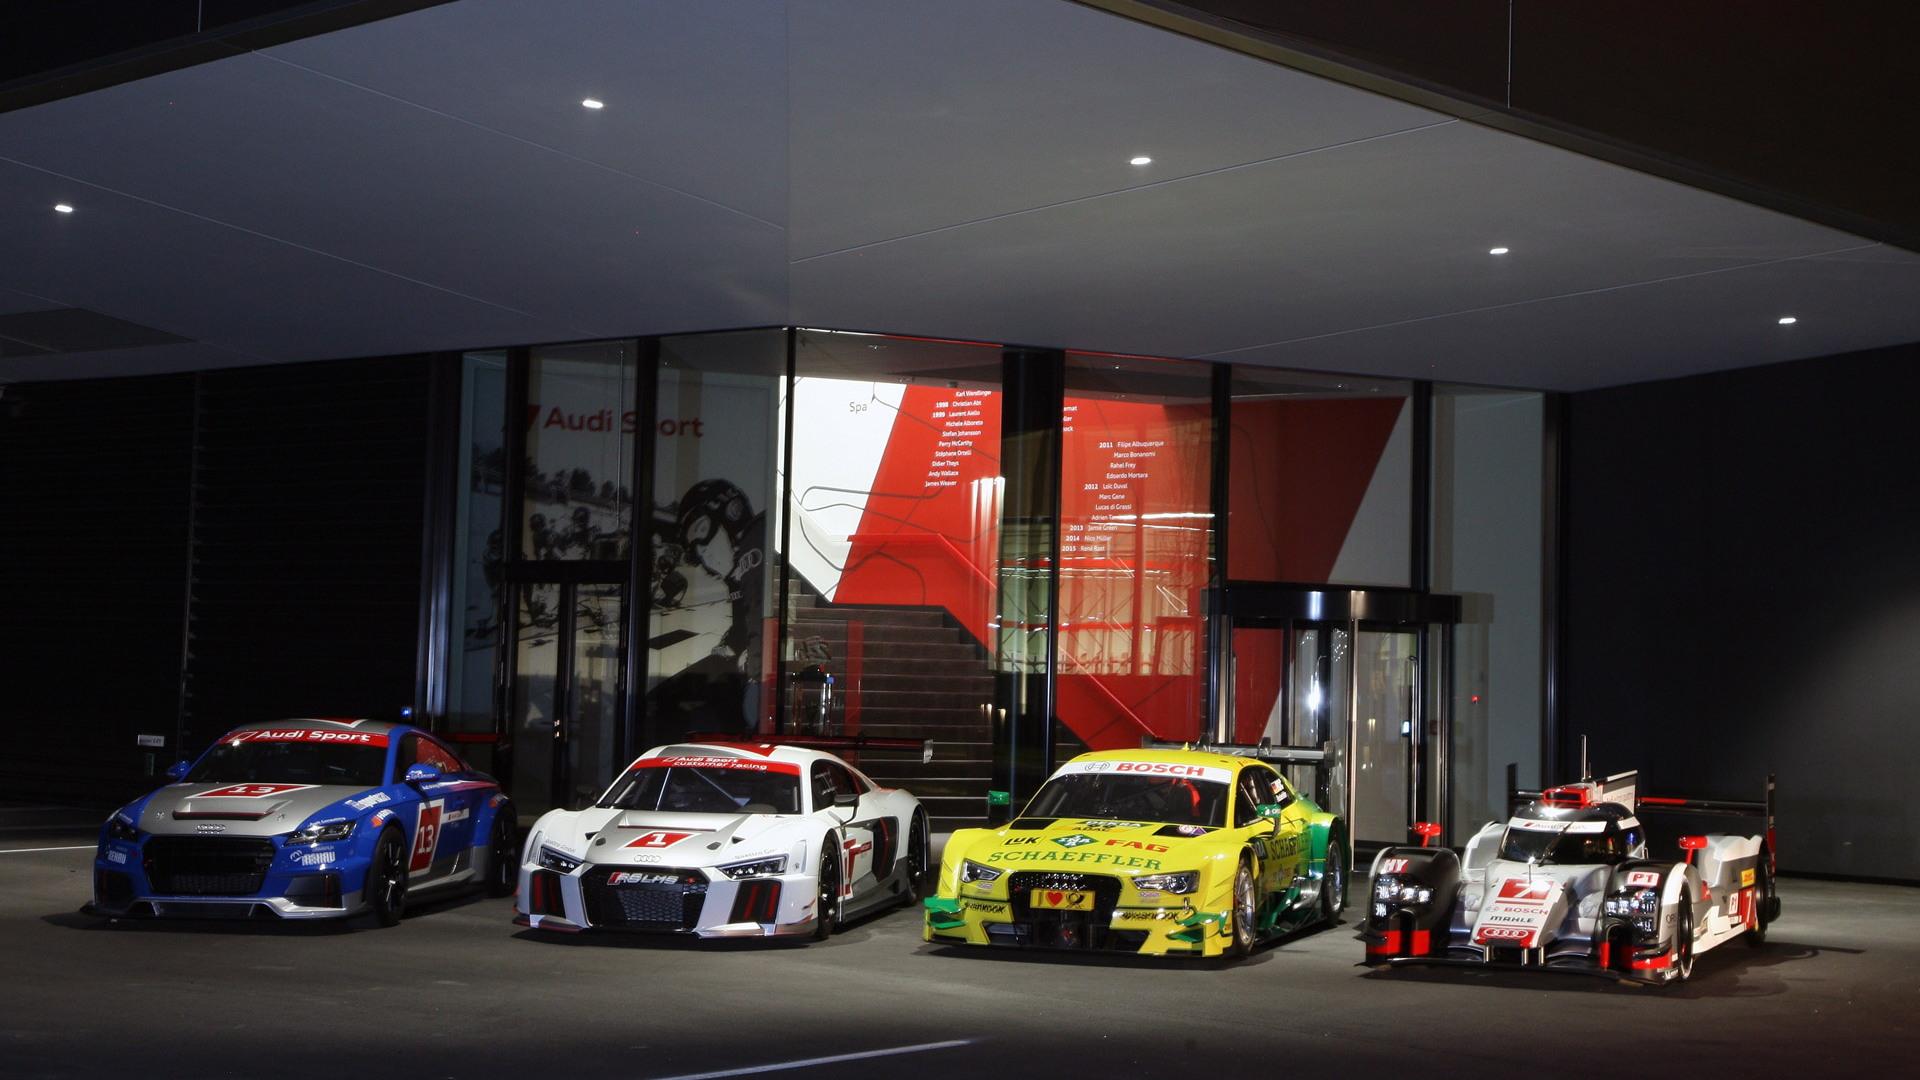 2015 Audi motorsports lineup